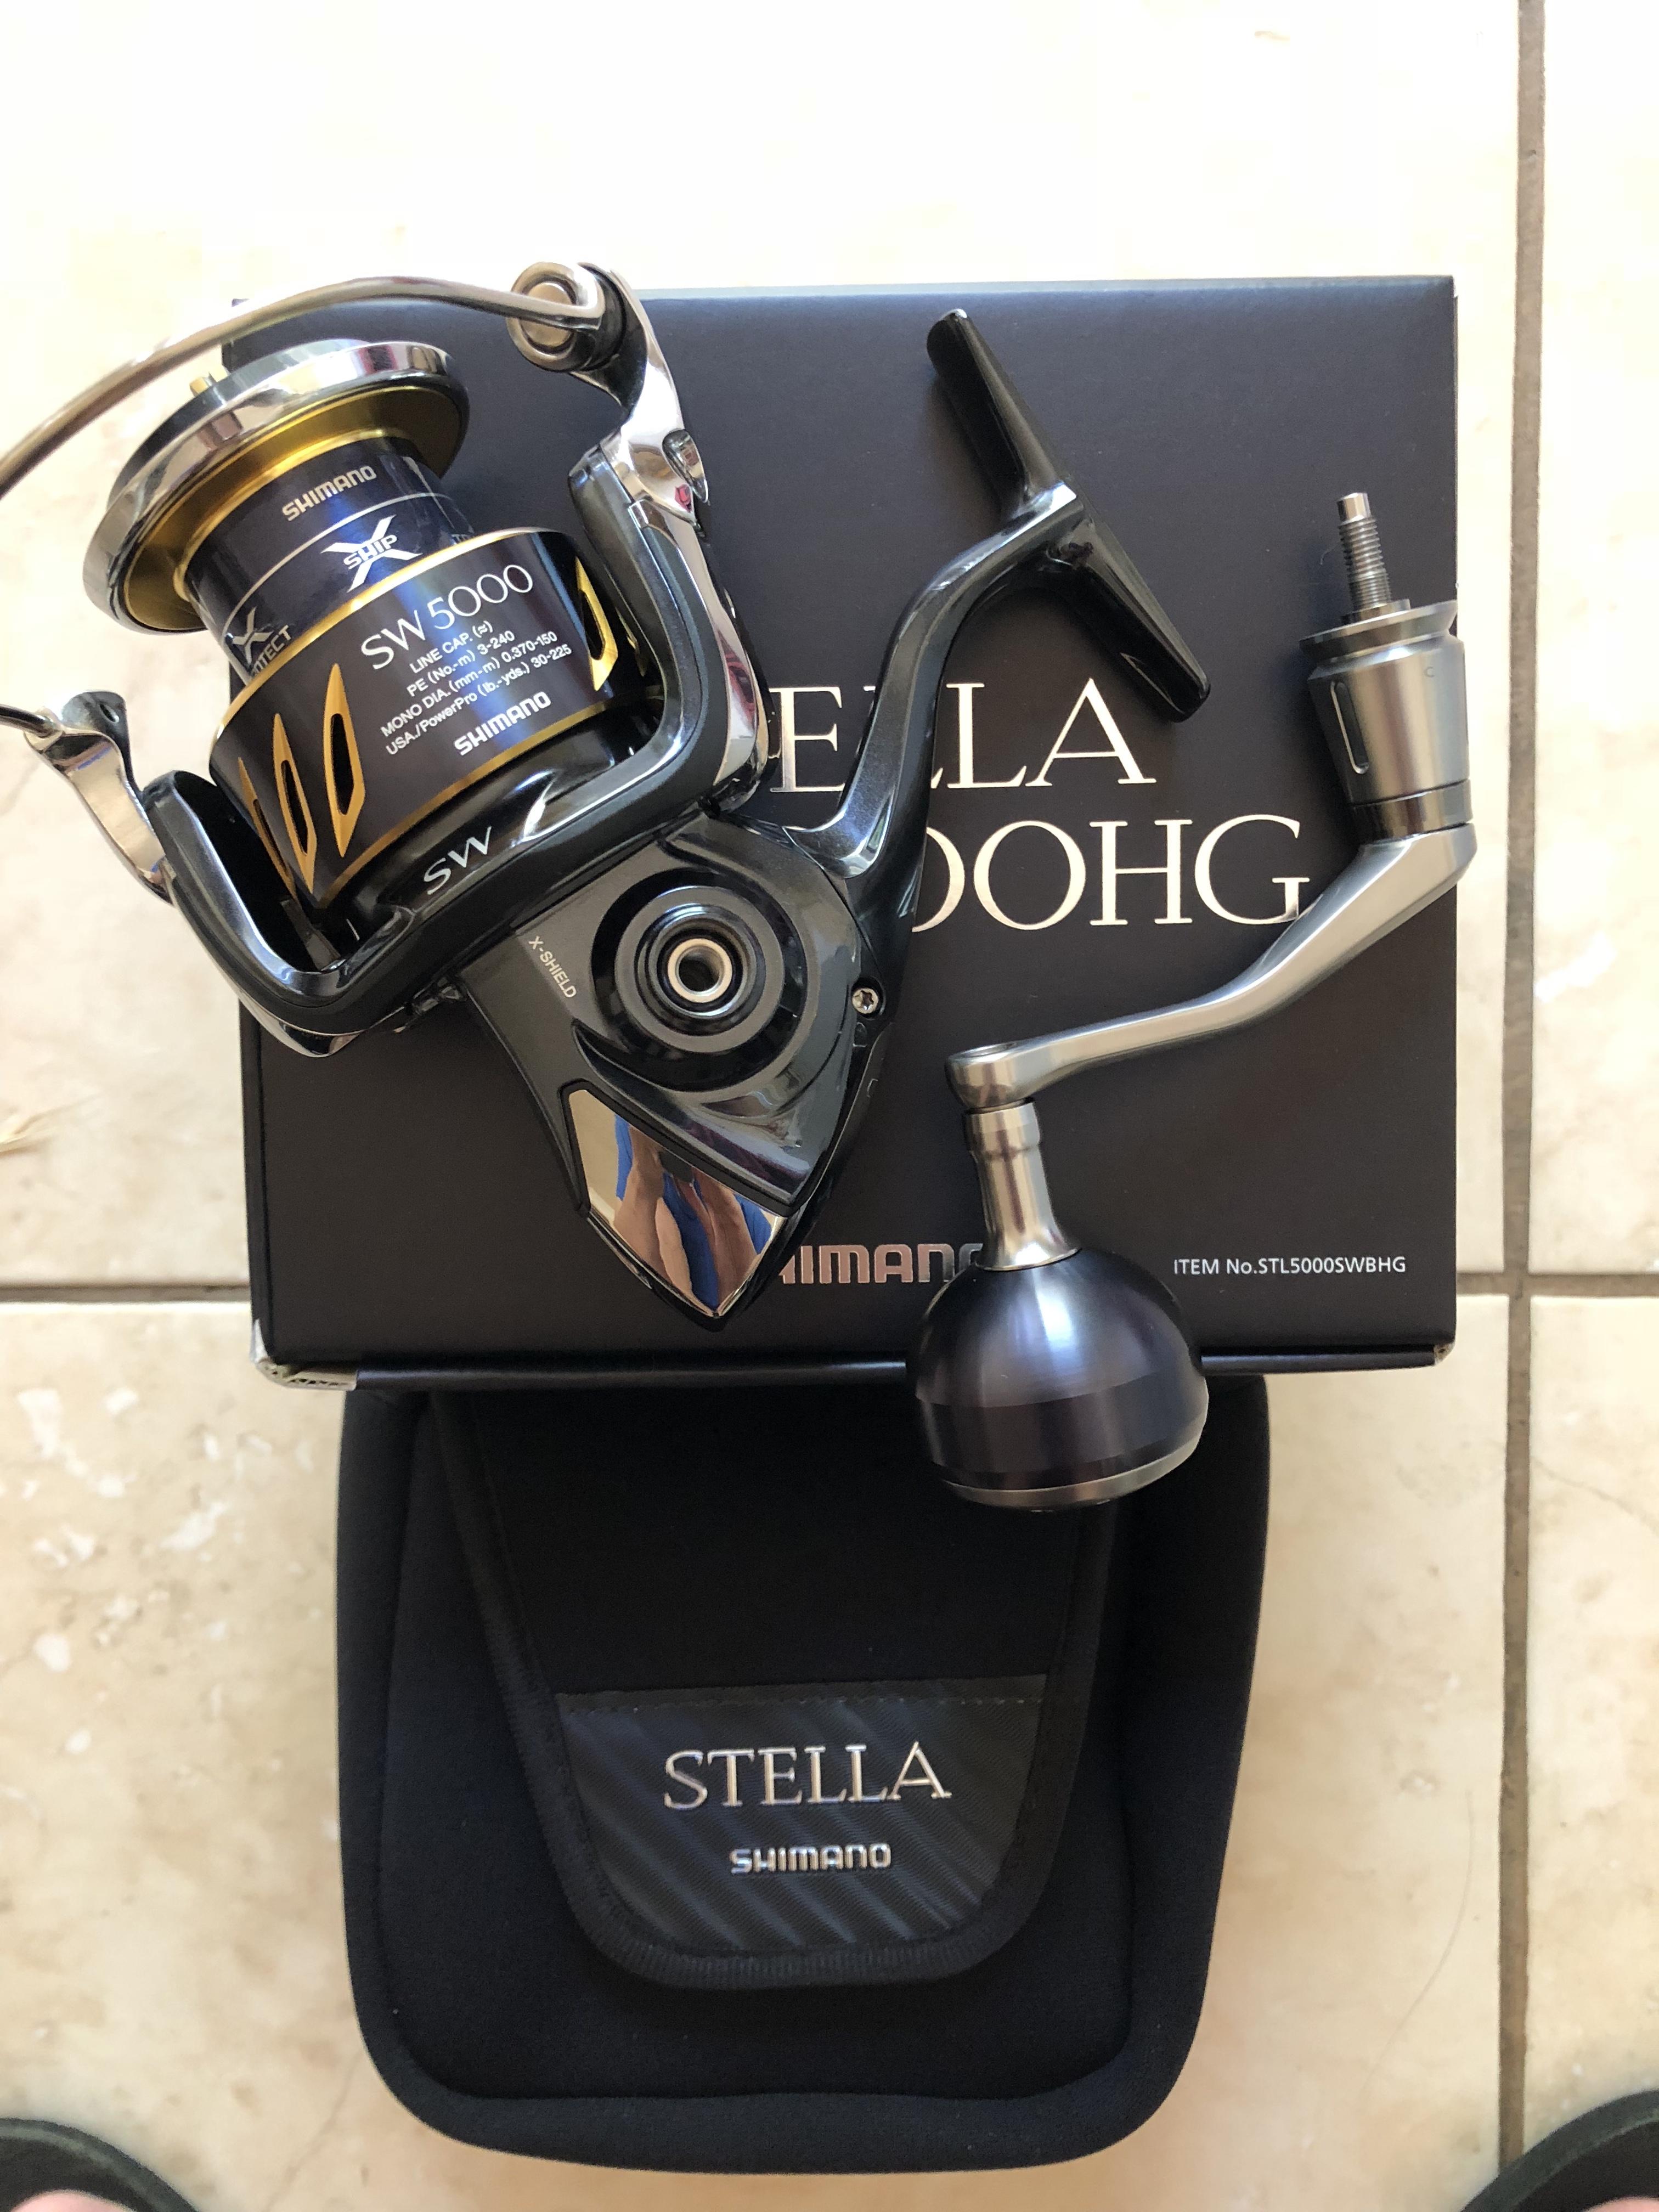 2018 Shimano Stella FJ 5000XG - General Buy/Sell/Trade Forum